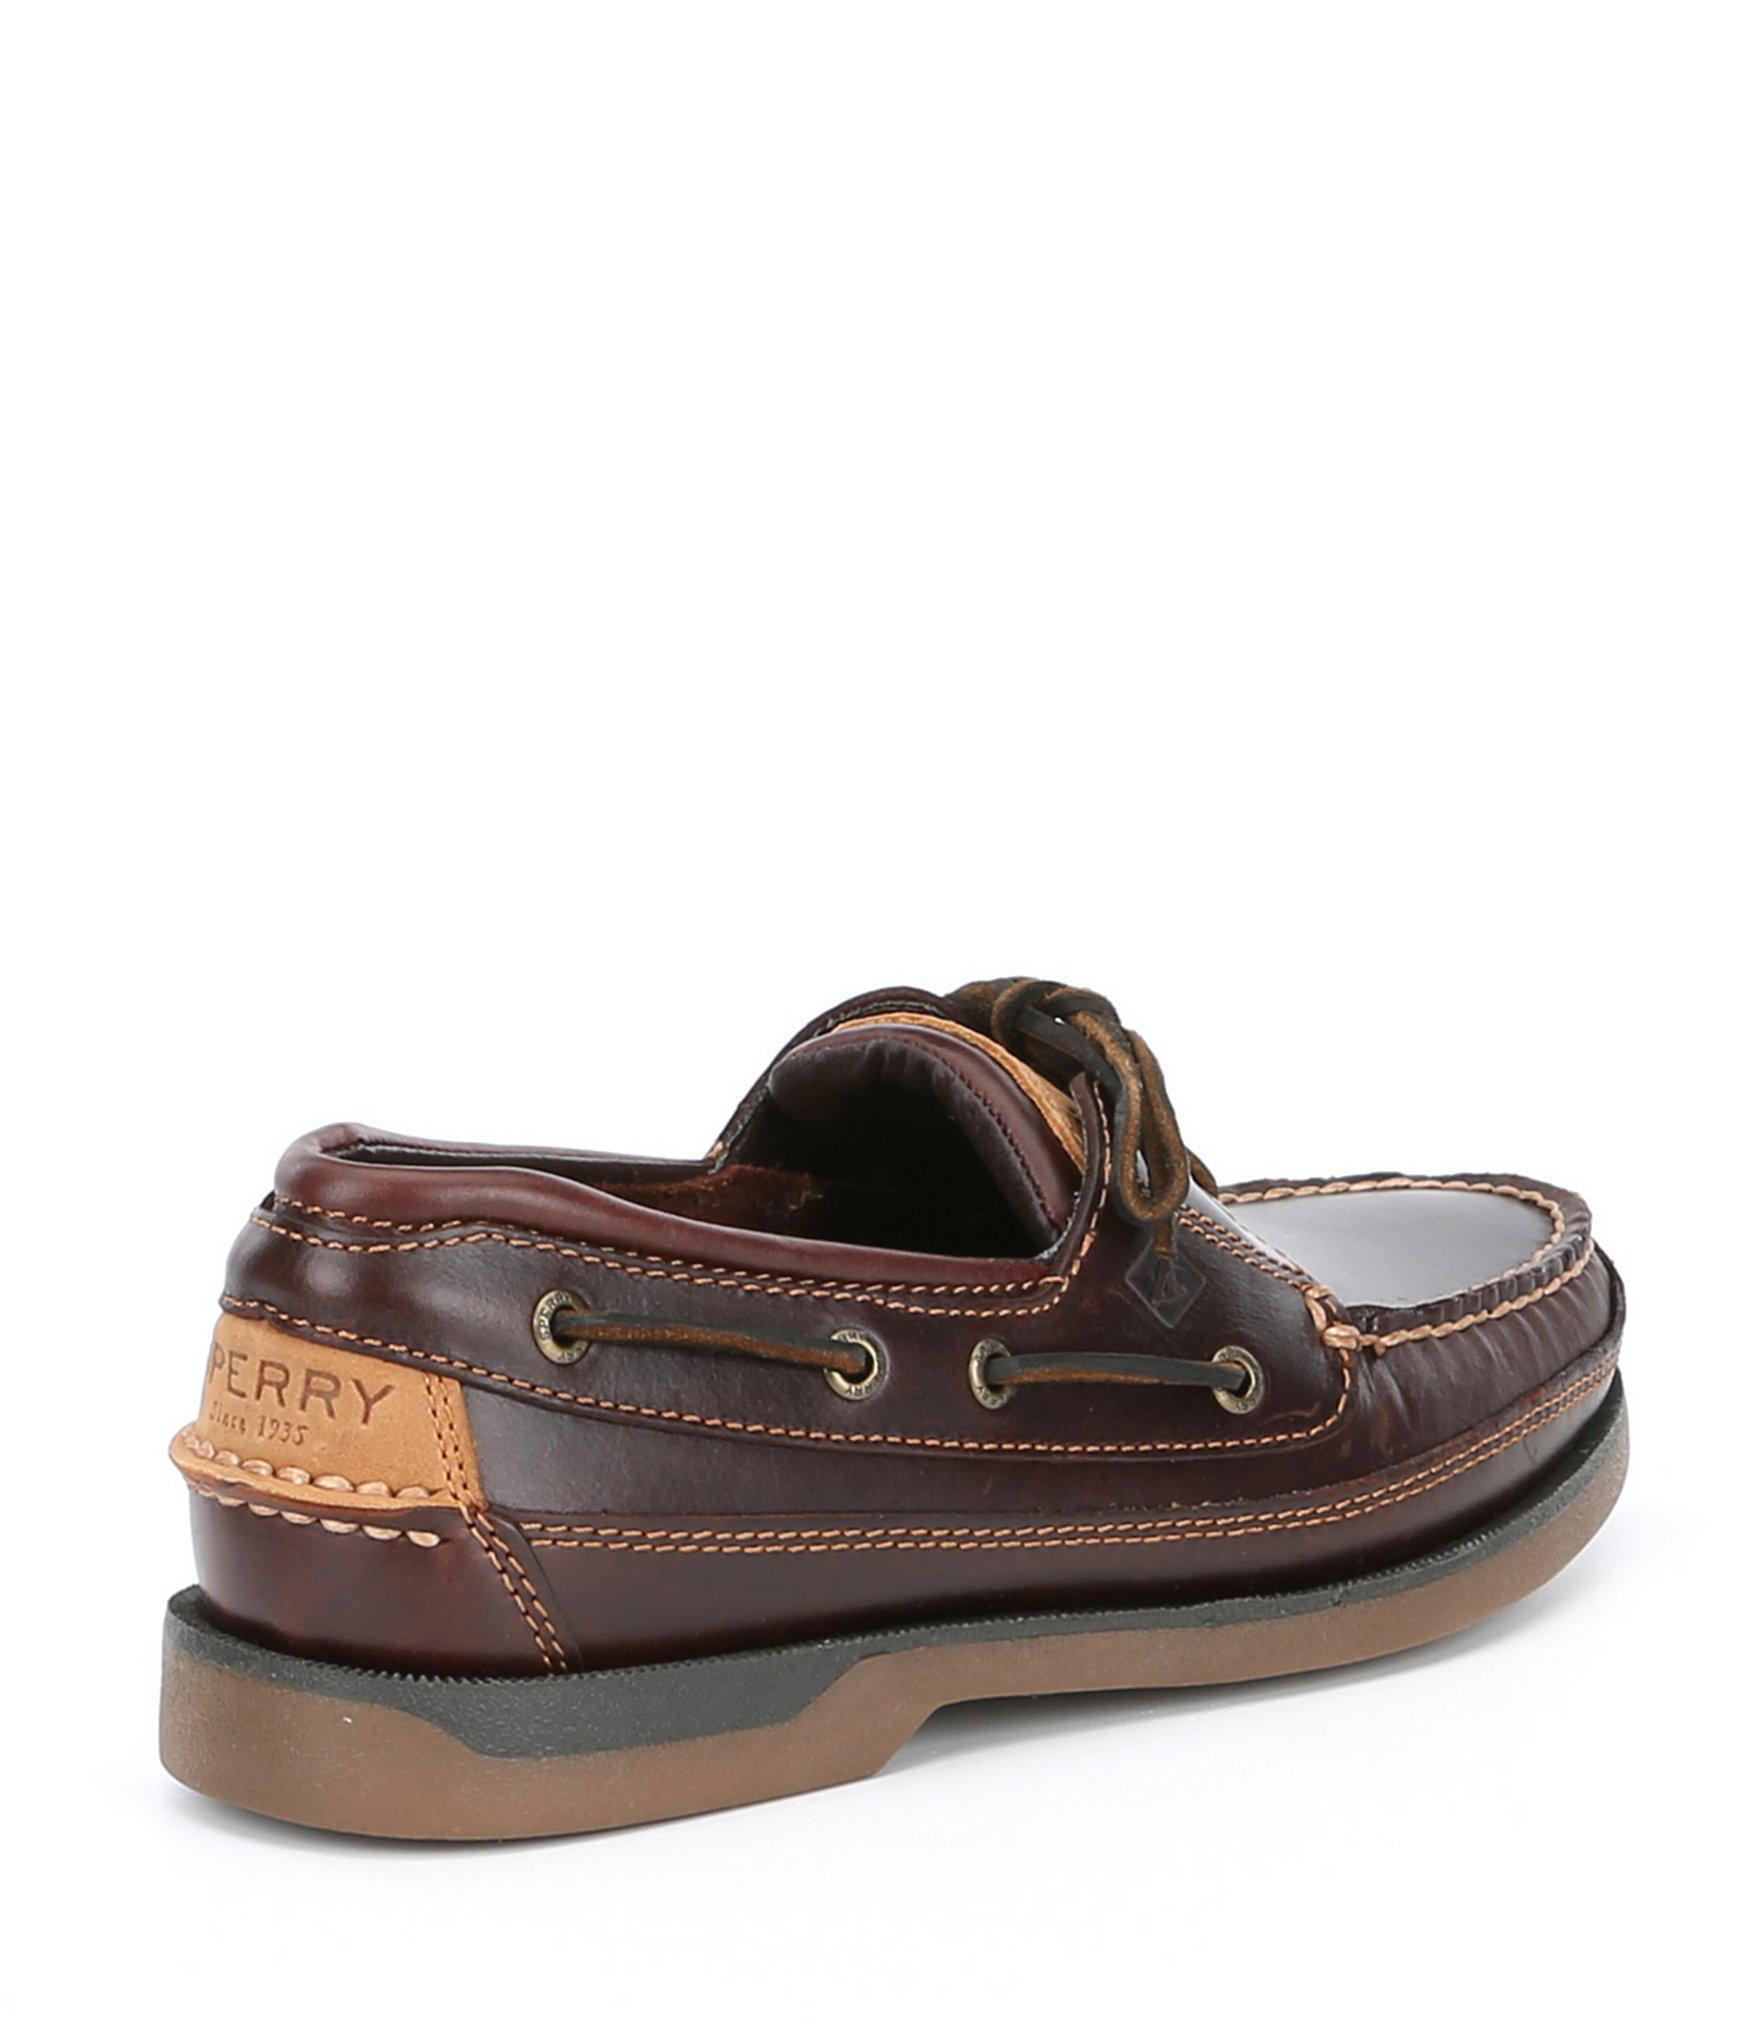 0413ced87b26 Sperry Top-Sider - Brown Men s Mako 2-eye Boat Shoe for Men -. View  fullscreen